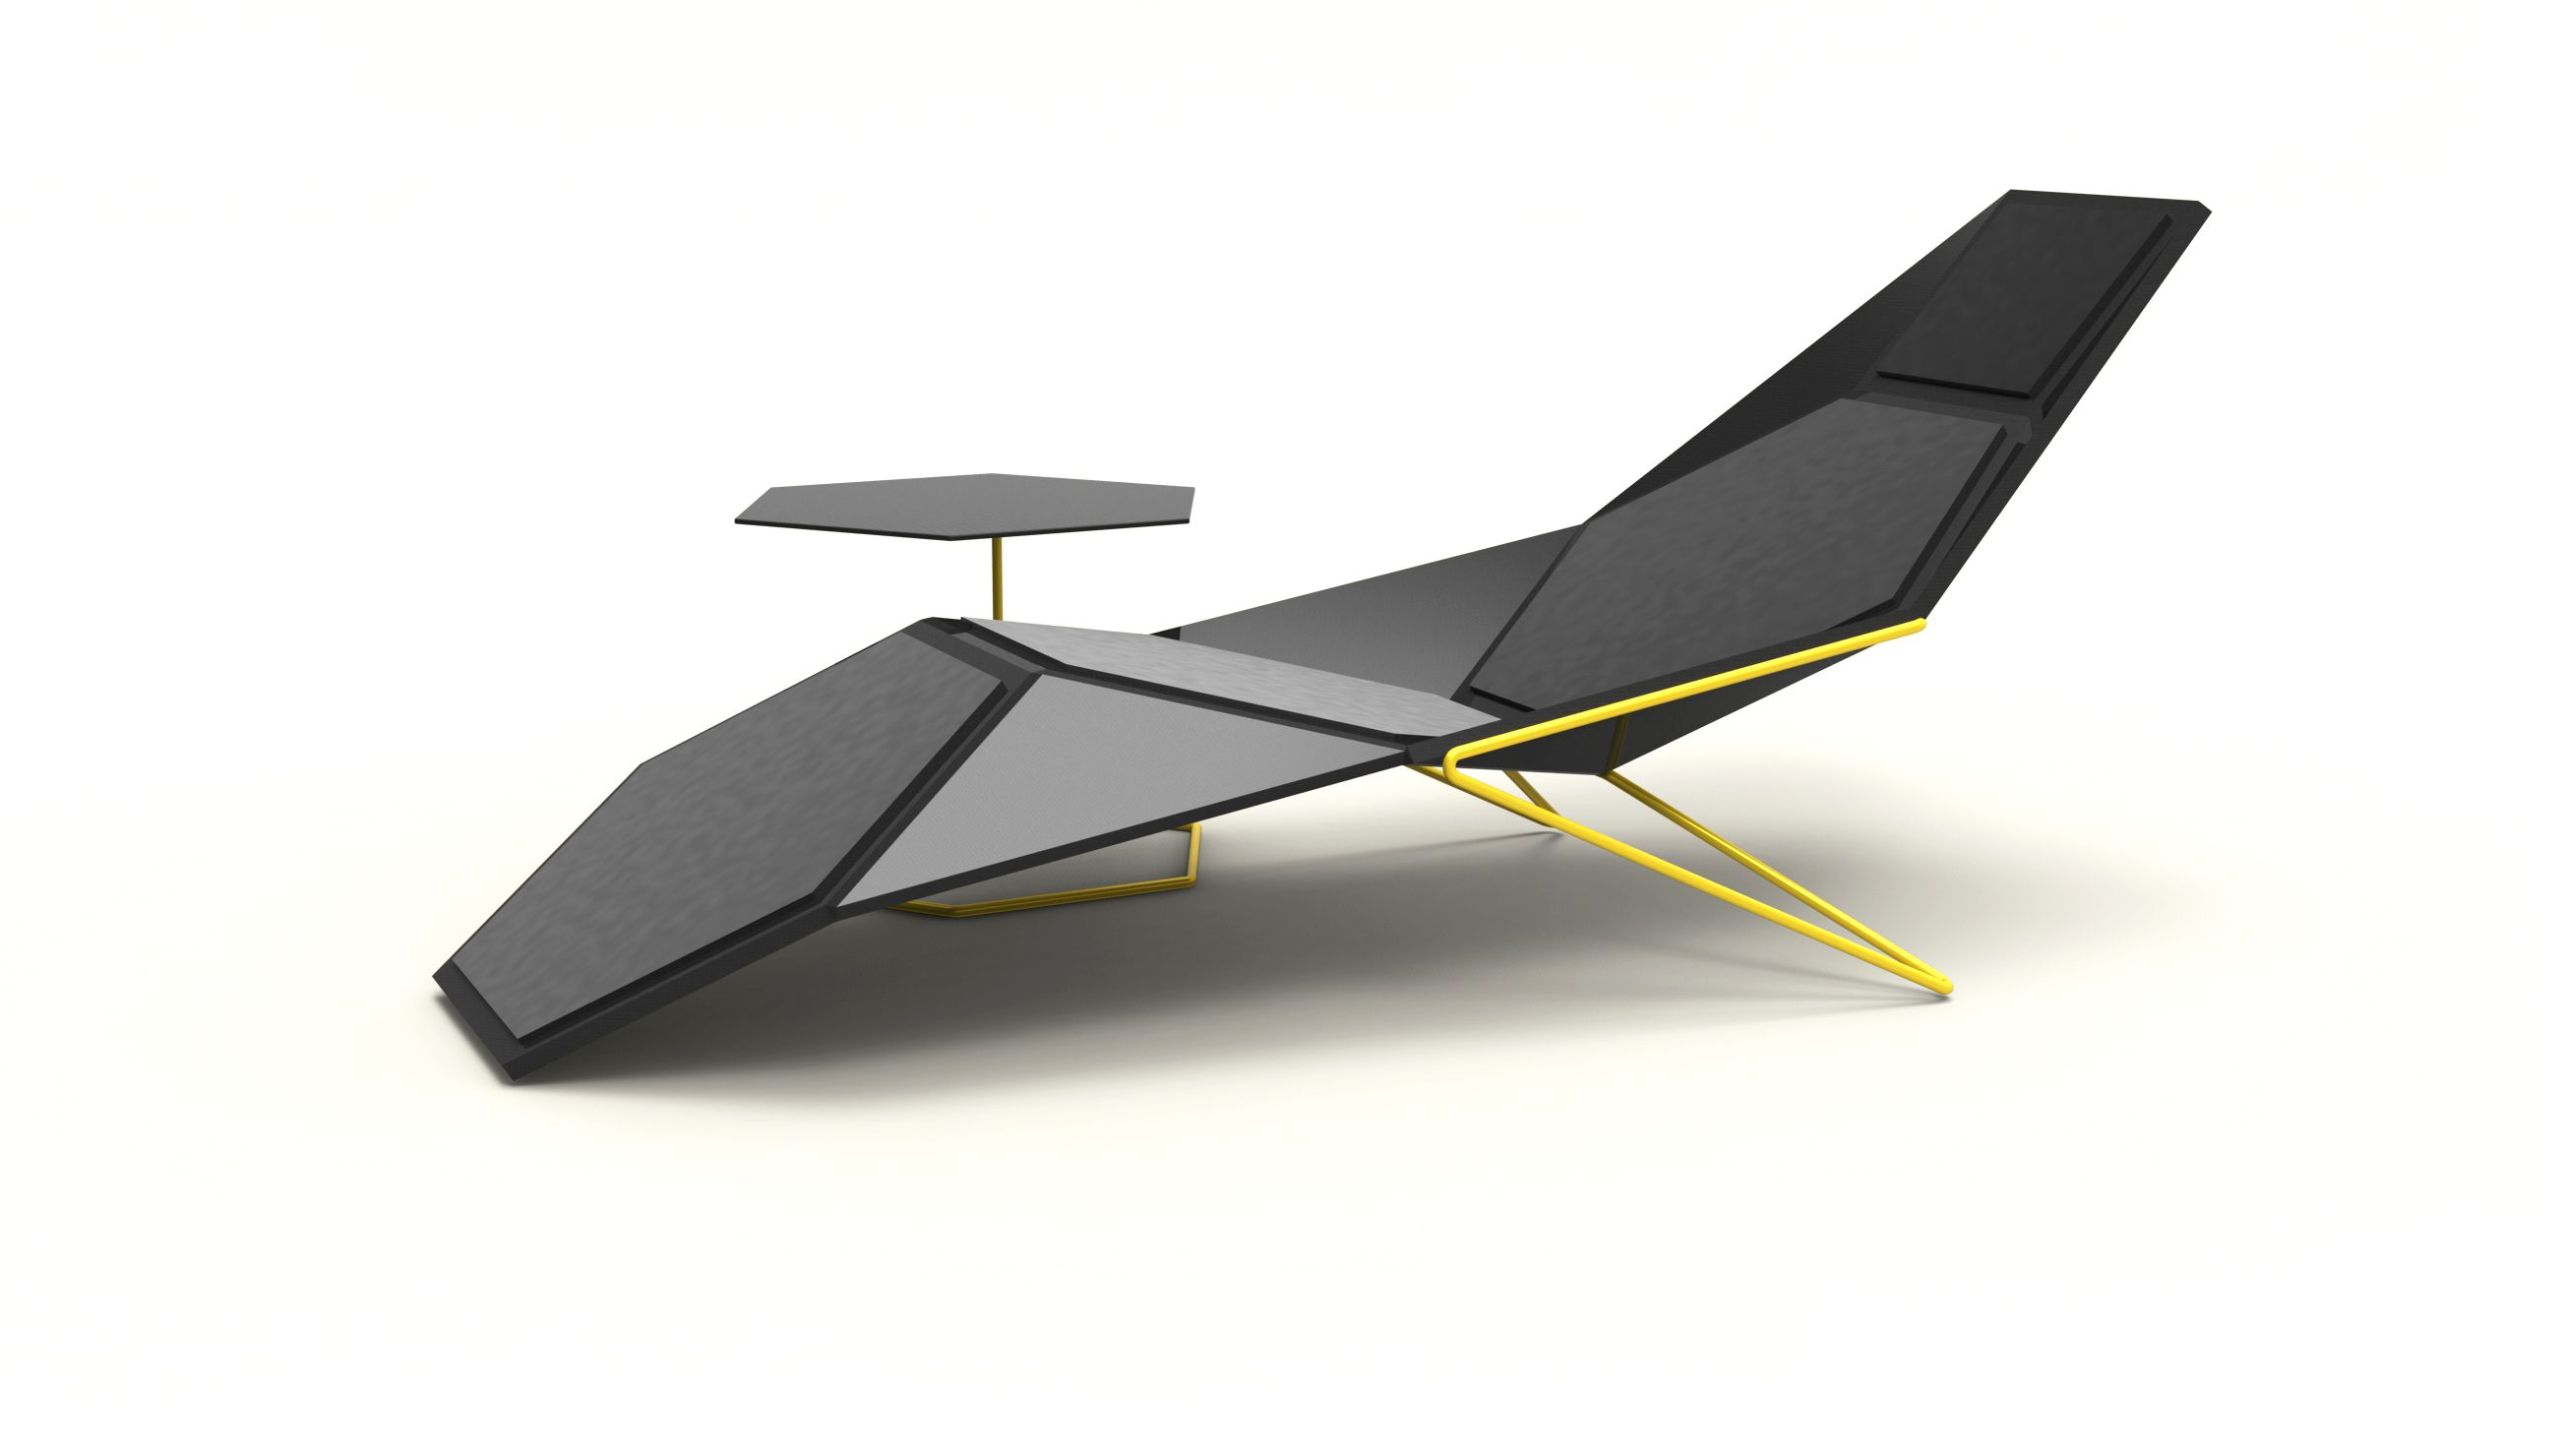 Best Futuristic Furniture Design Concept 4339 Affordable ...